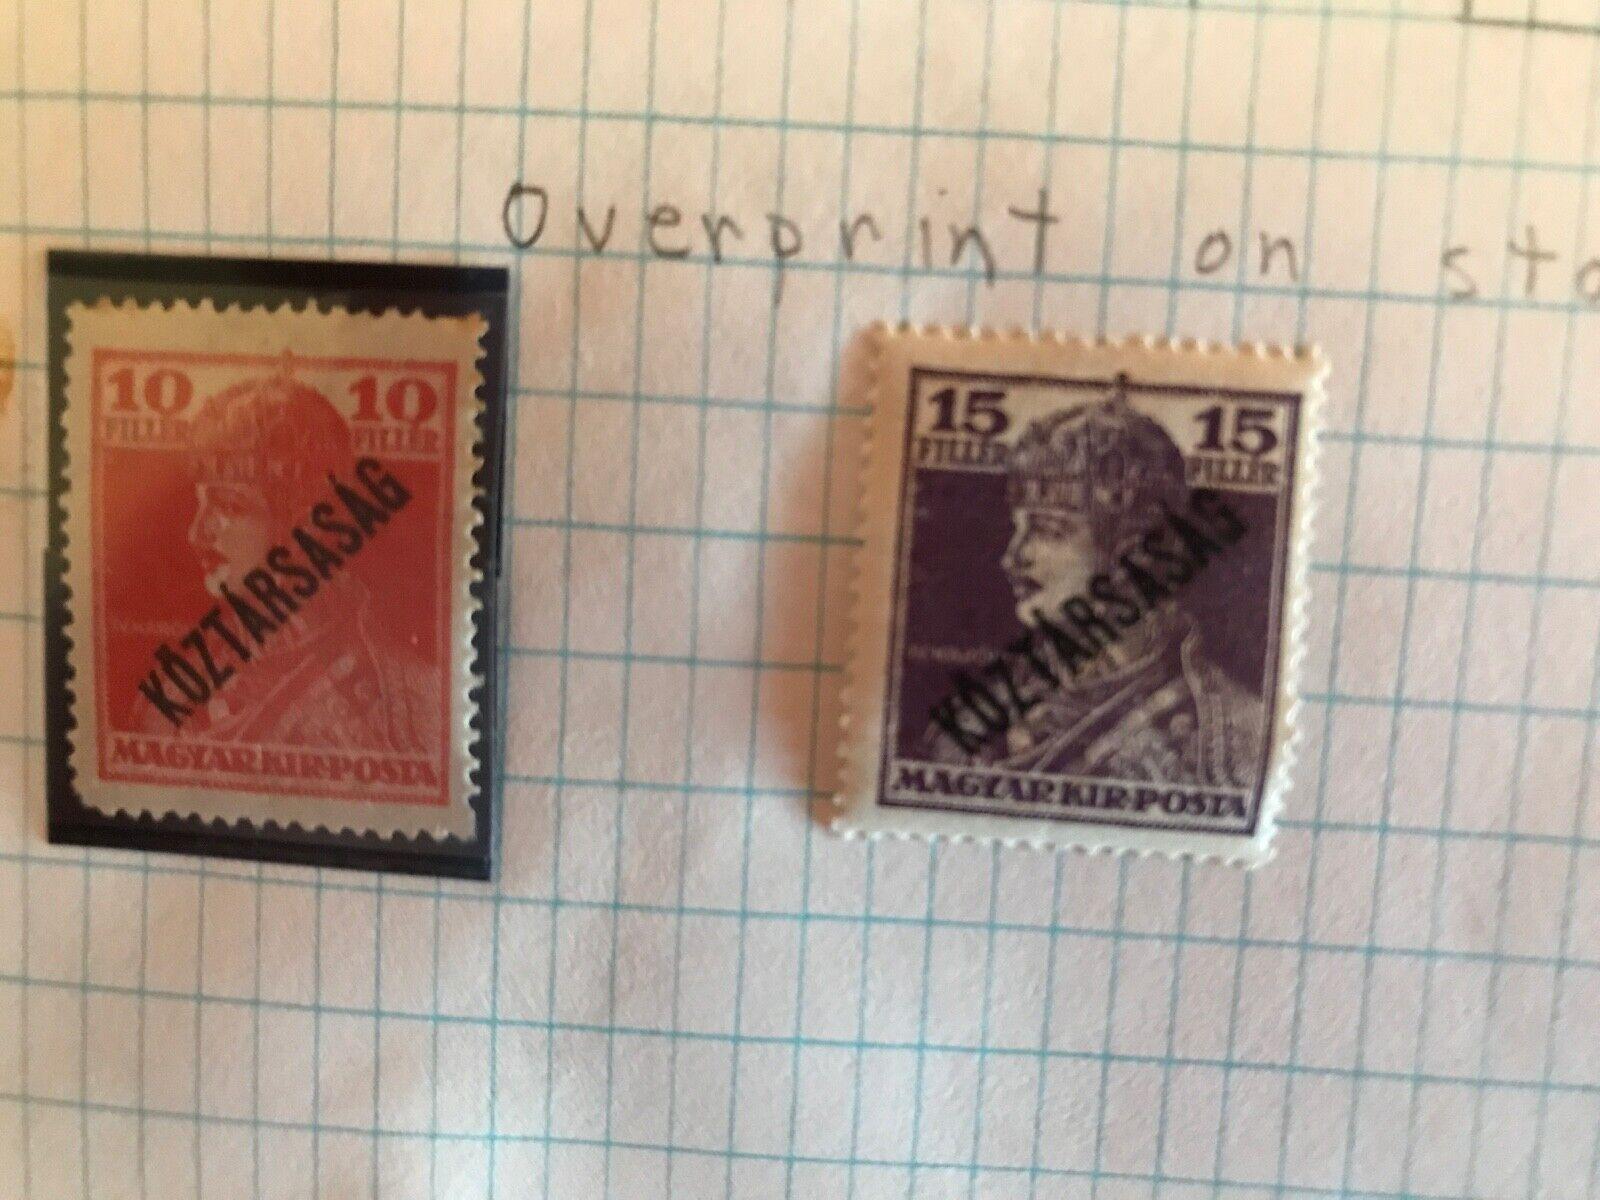 Vintage Hungary KOZTARSASAG OVERPRINT Issued 1918-1919 Lot Of 12 Stamps - $2.00